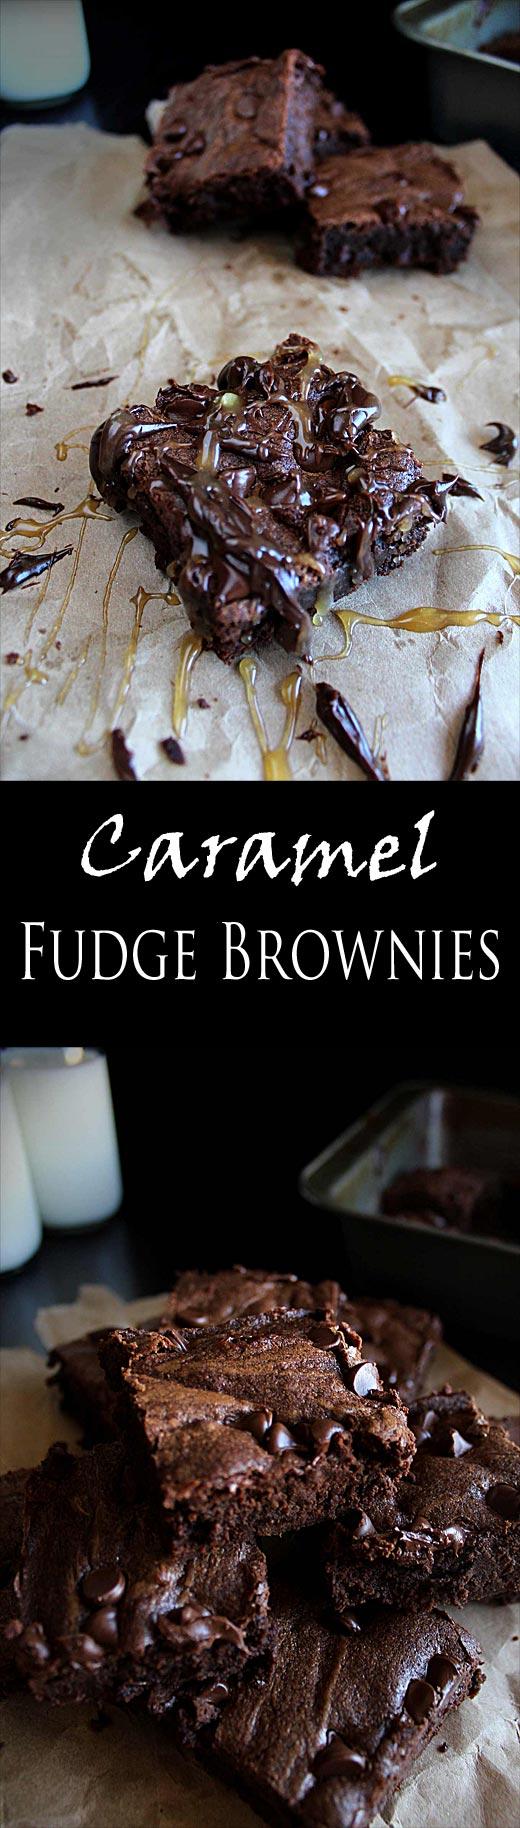 Chocolate Chunk Caramel Fudge Brownies   Chocolate Brownies   Homemade Hot Fudge   Caramel Sauce   Homemade Brownie Recipe